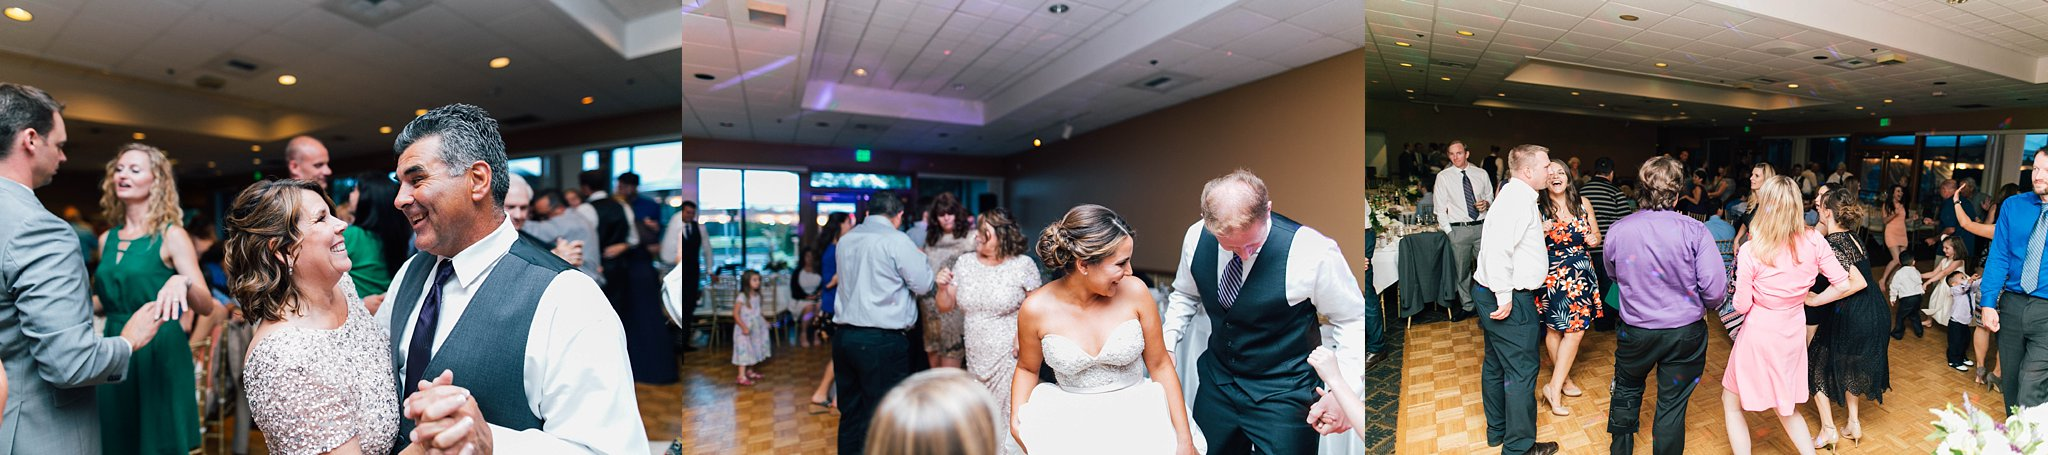 ashley_vos_seattle_wedding_photographer_0102.jpg